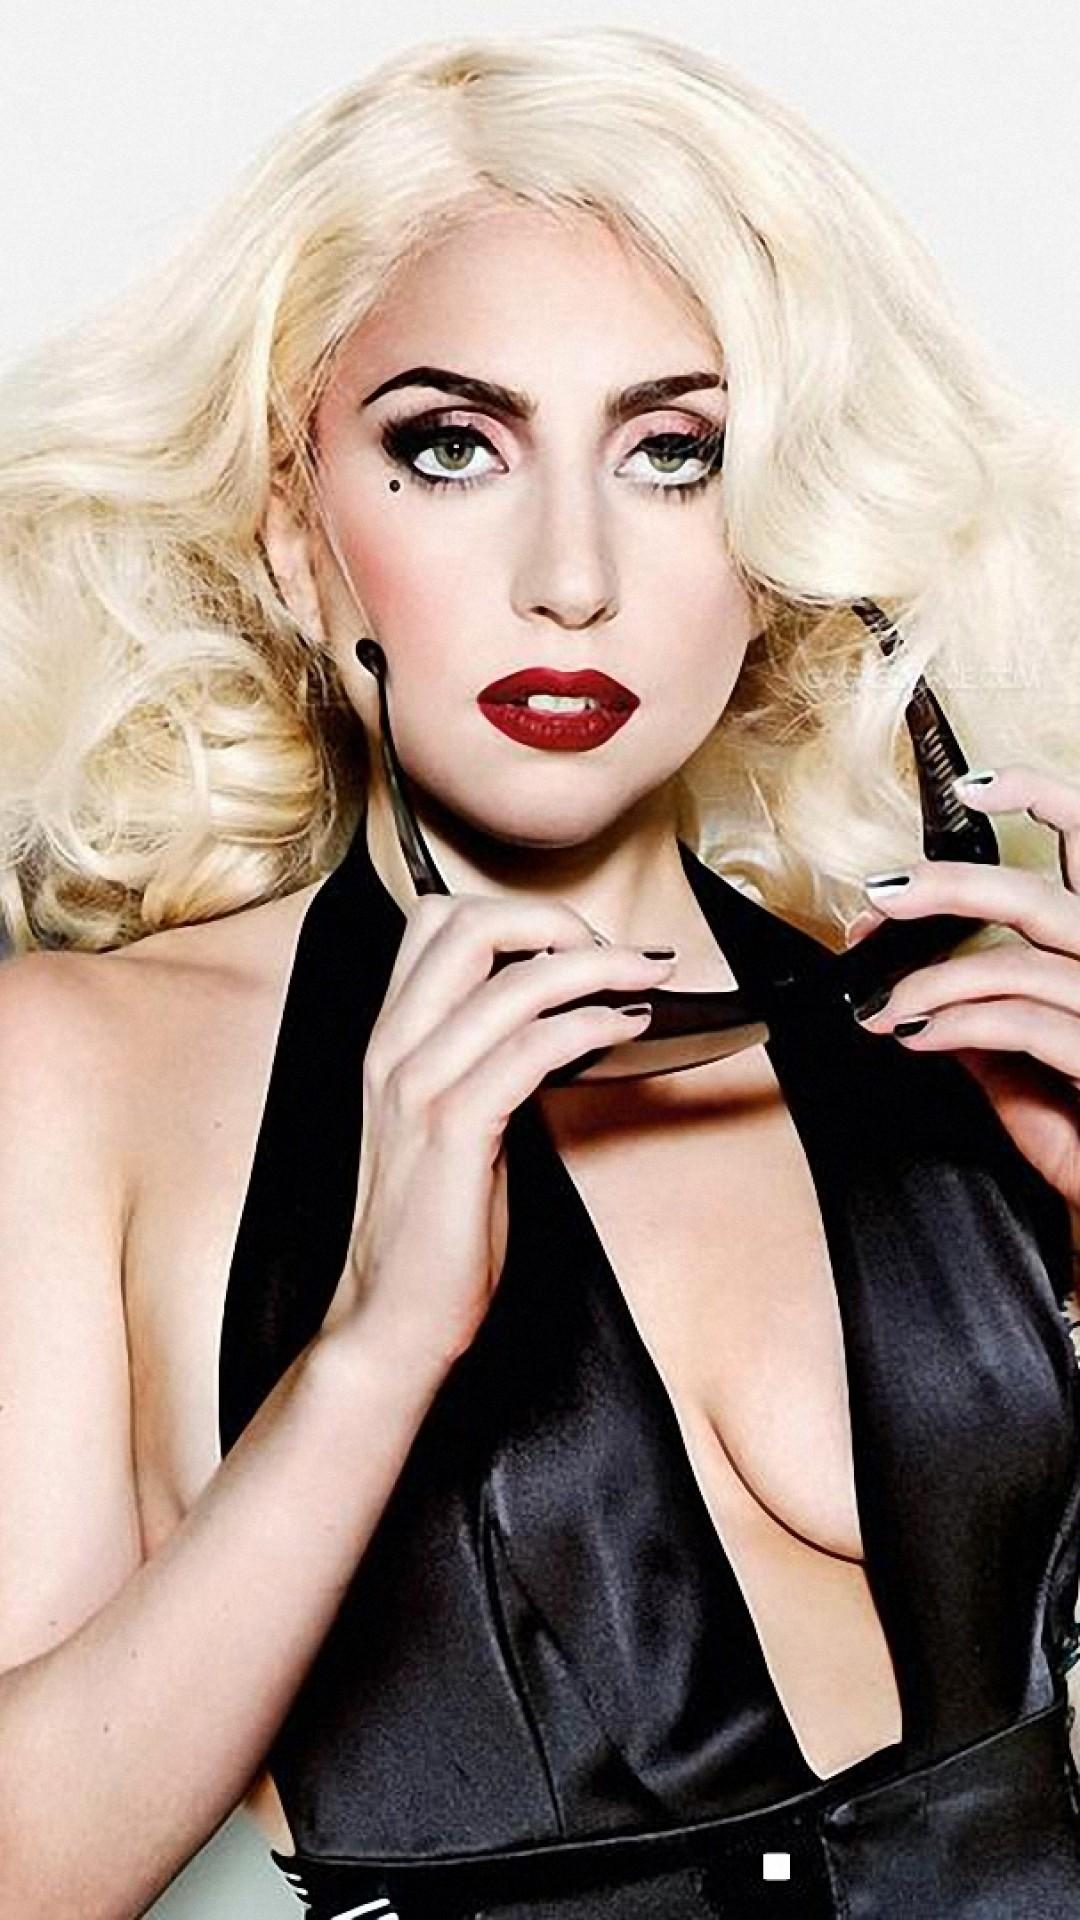 Desktop Wallpaper Stylish Girl Lady Gaga Wallpaper 2018 79 Images